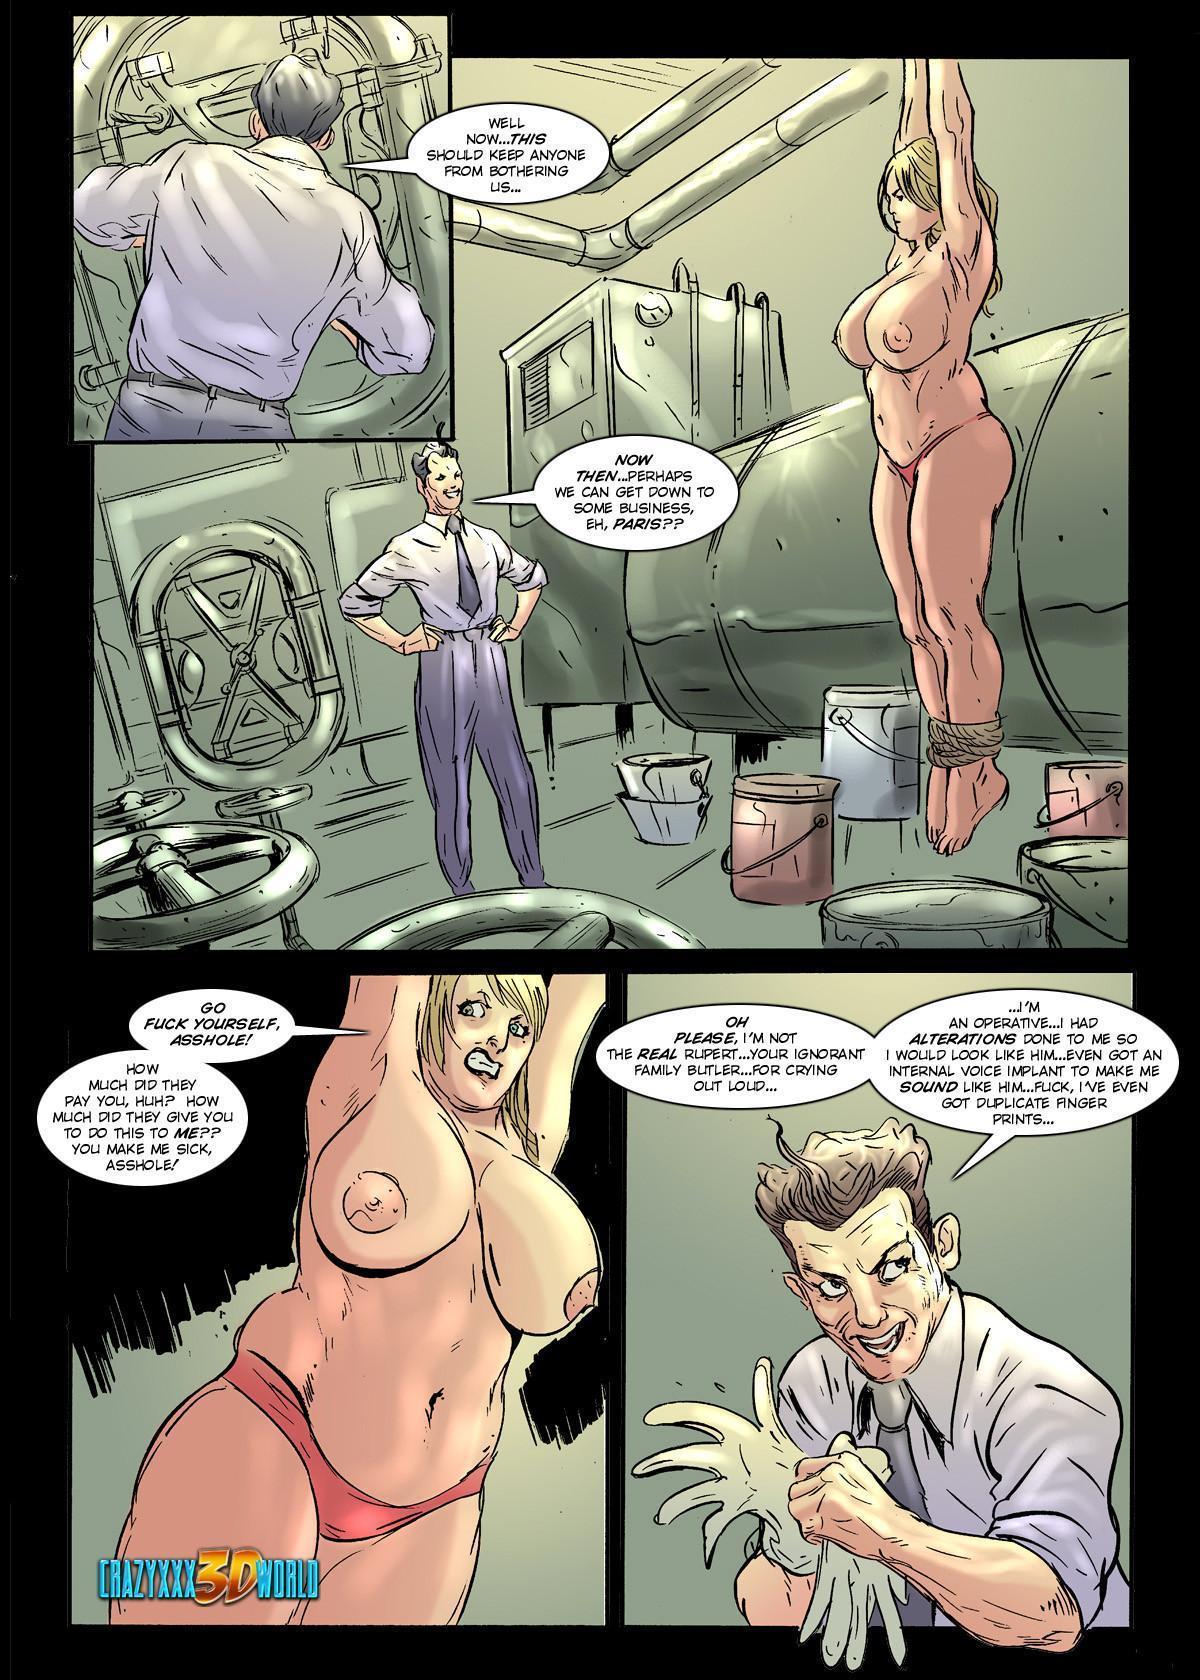 Whorelore session 2 erotic image